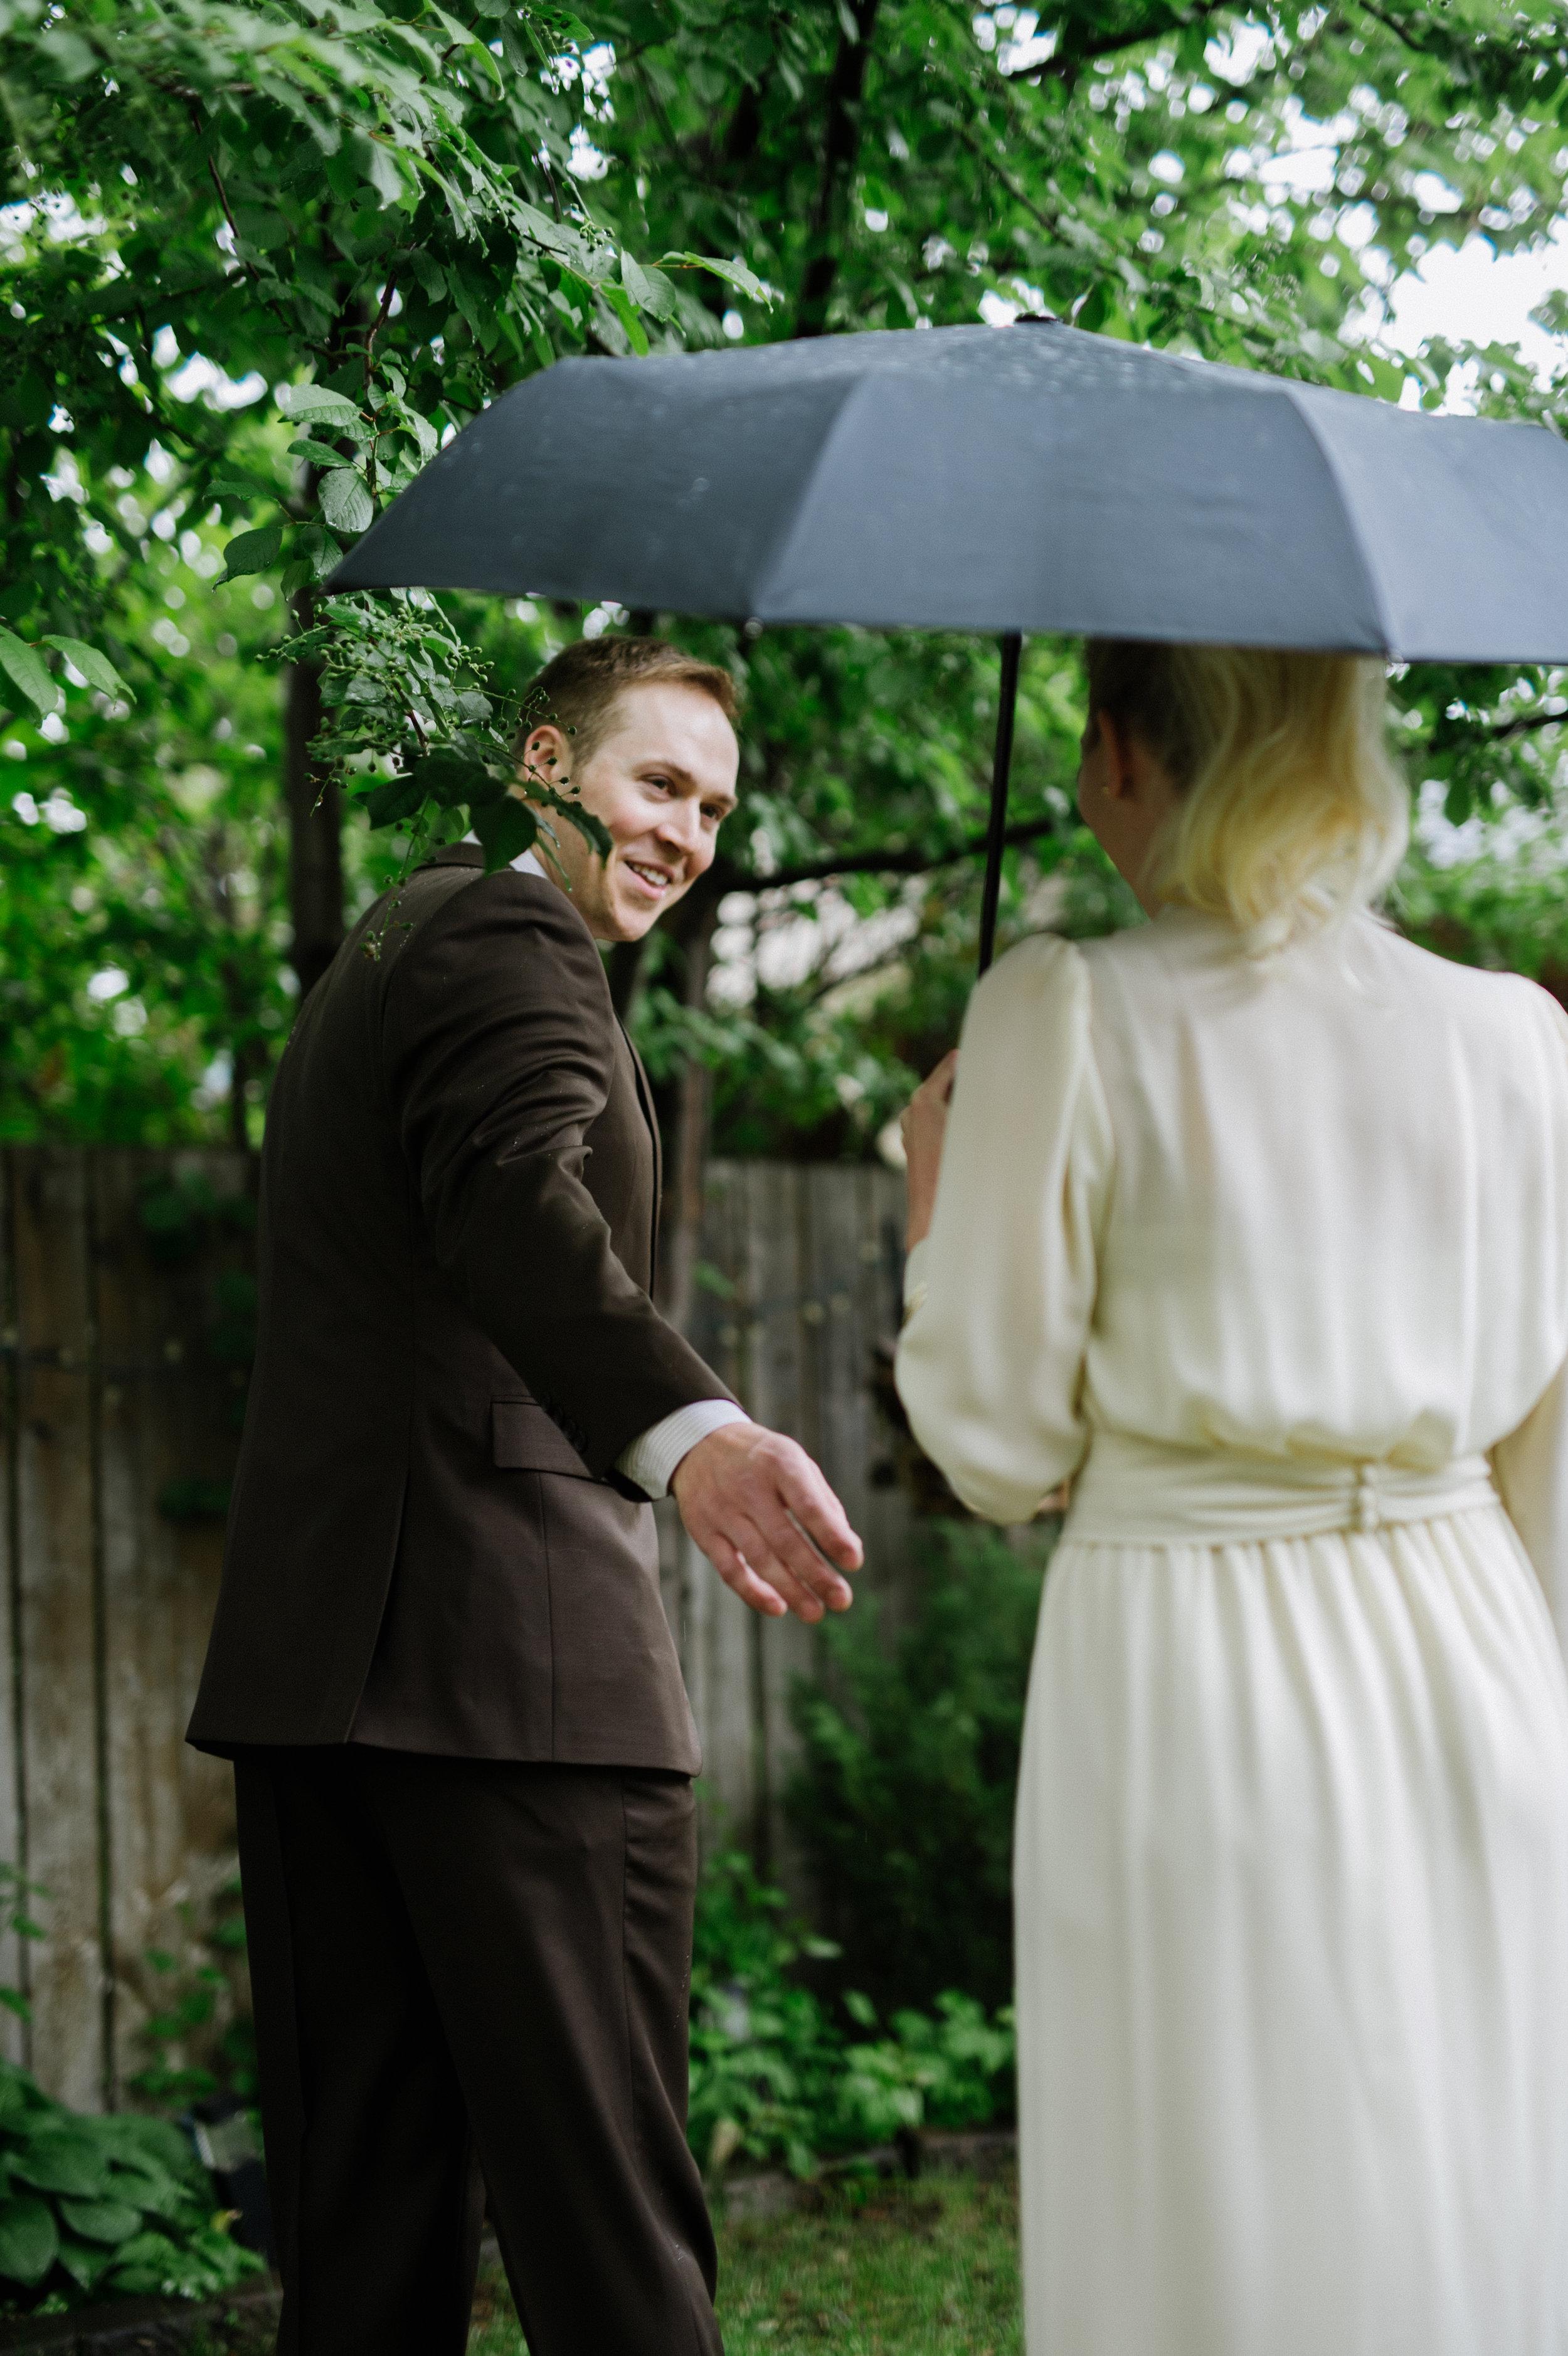 Teatro_Wedding_Calgary_Wedding_Photography_Vanessa_Tom_Married_2018_HR135.jpg